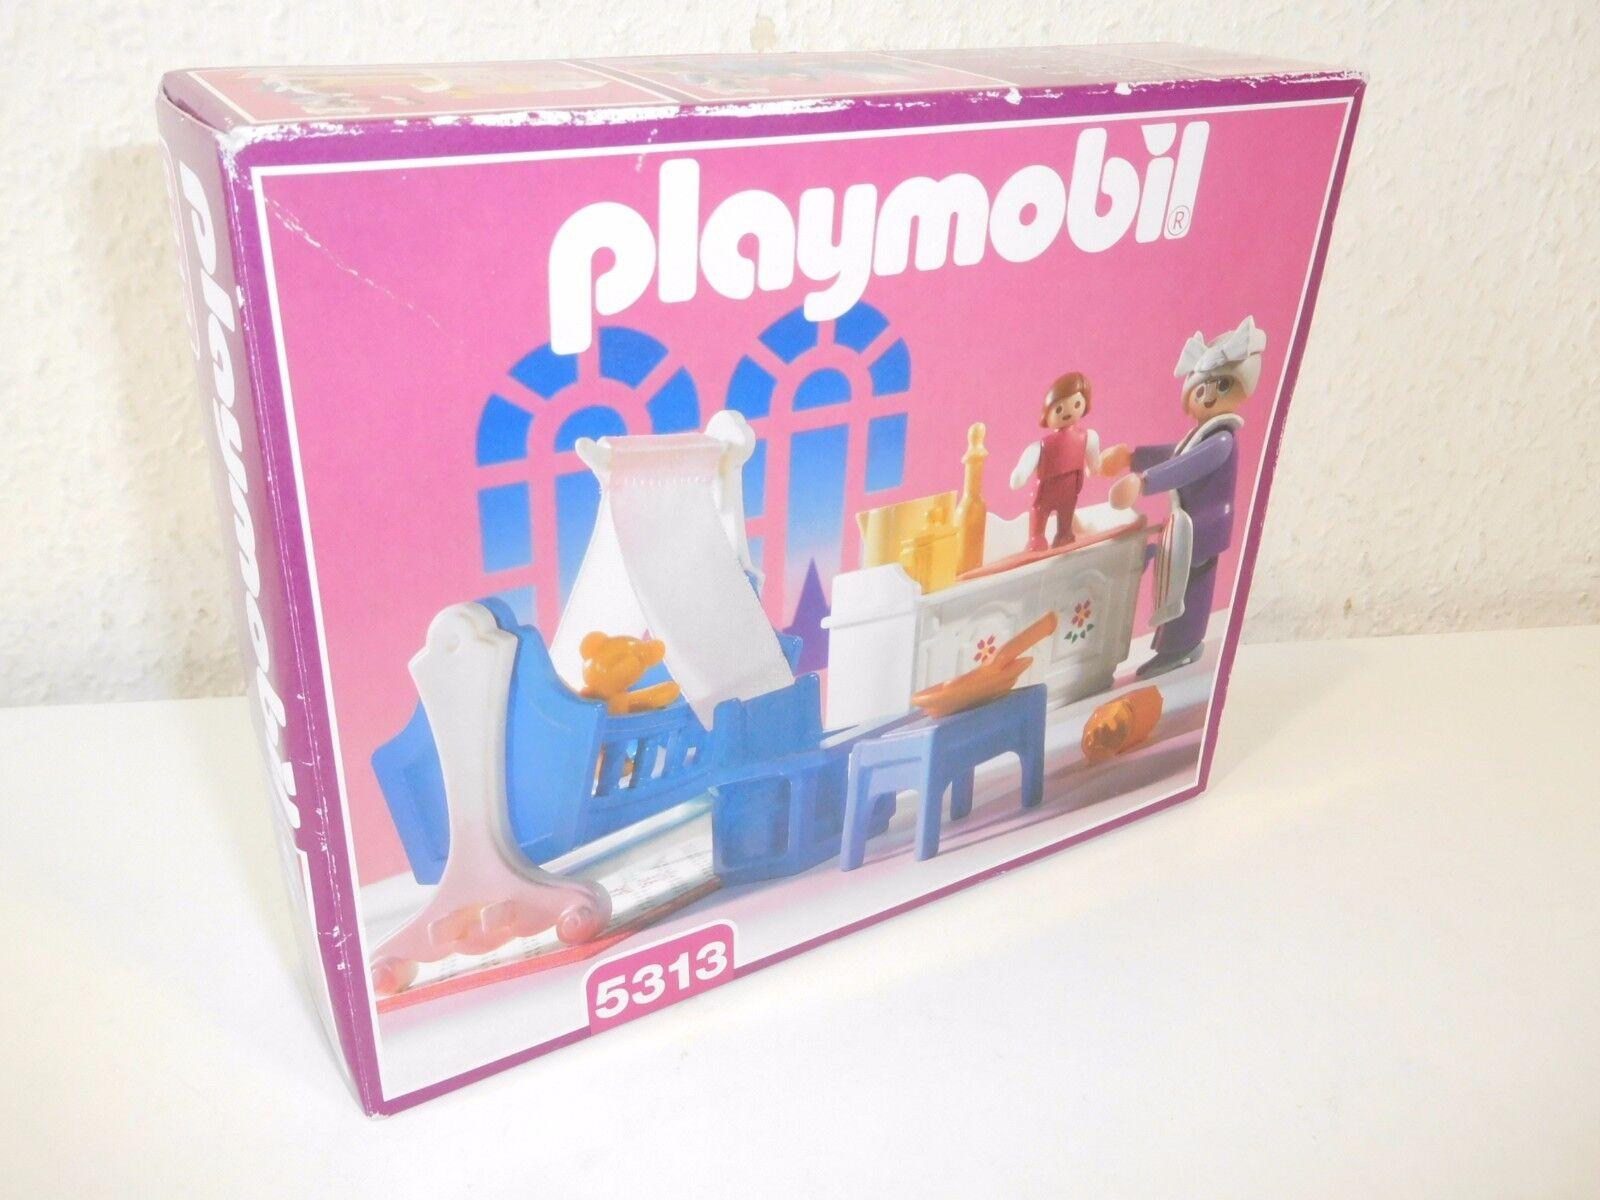 Babyroom 5313 new neu misb  for 5300 dollhouse Playmobil